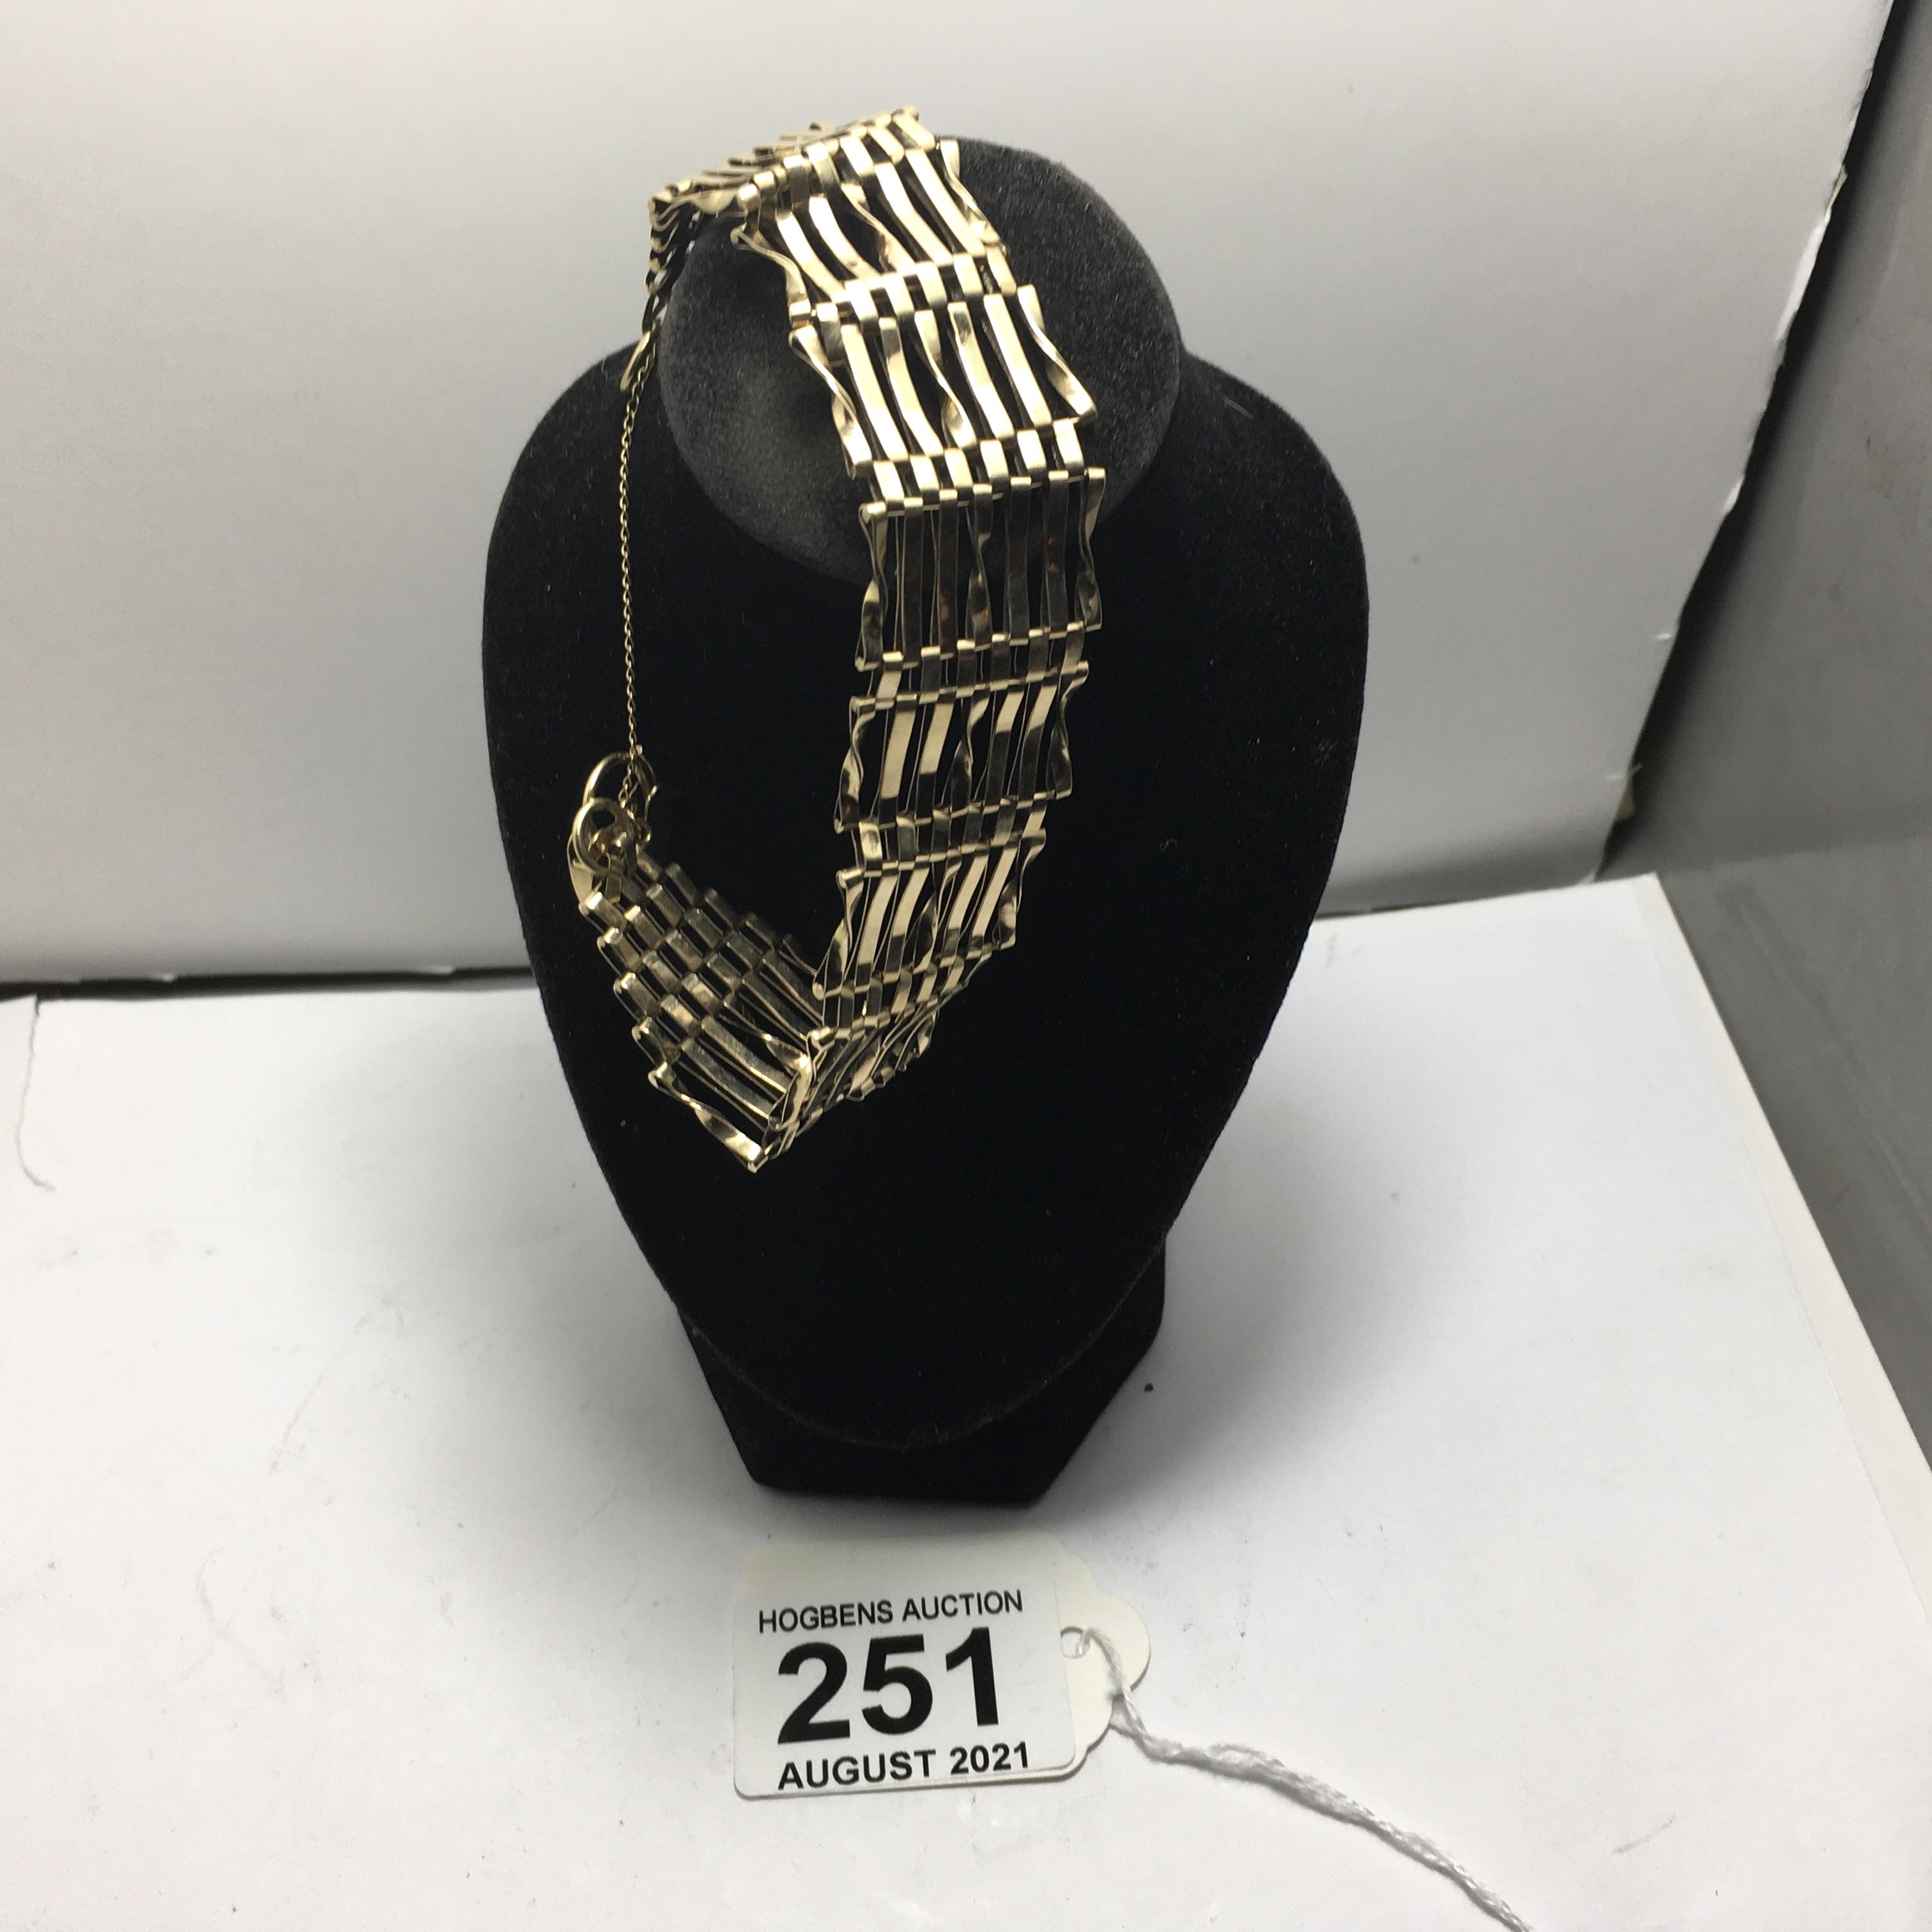 9ct gold ladies gate bracelet, 11 grams - Image 3 of 4